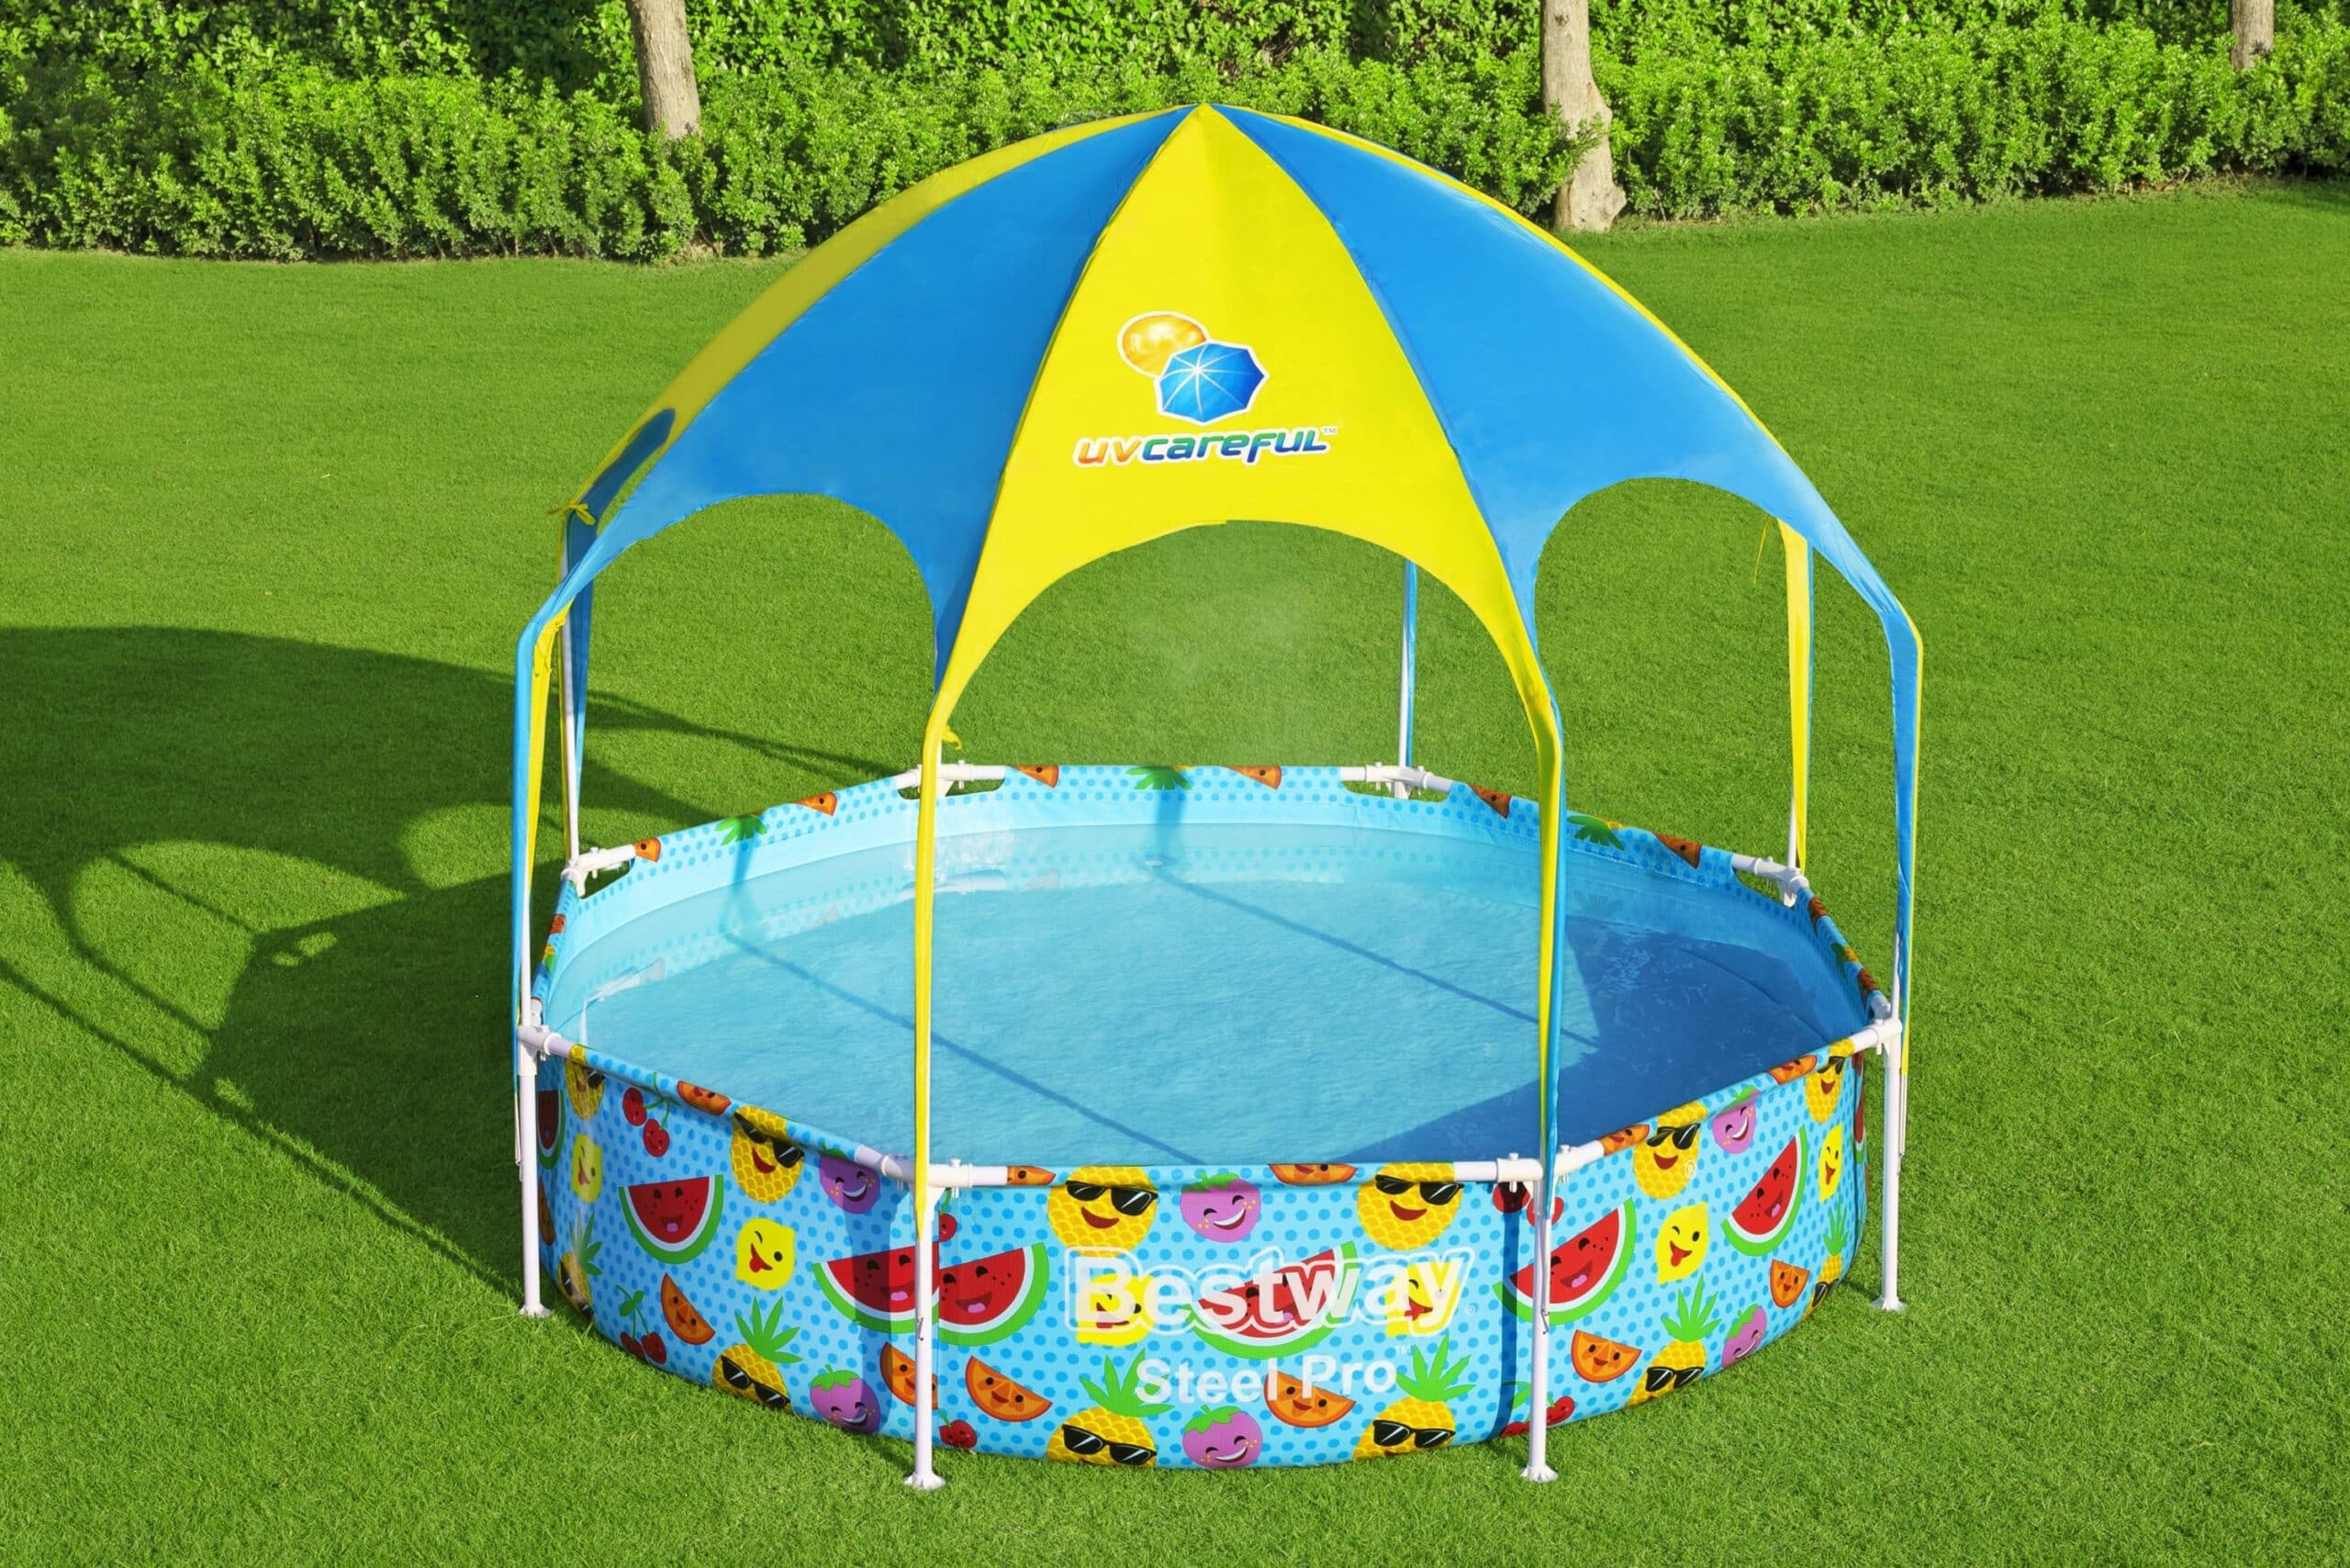 Rundt Steel Pro UV Careful bassengsett bestway svømmebasseng barn